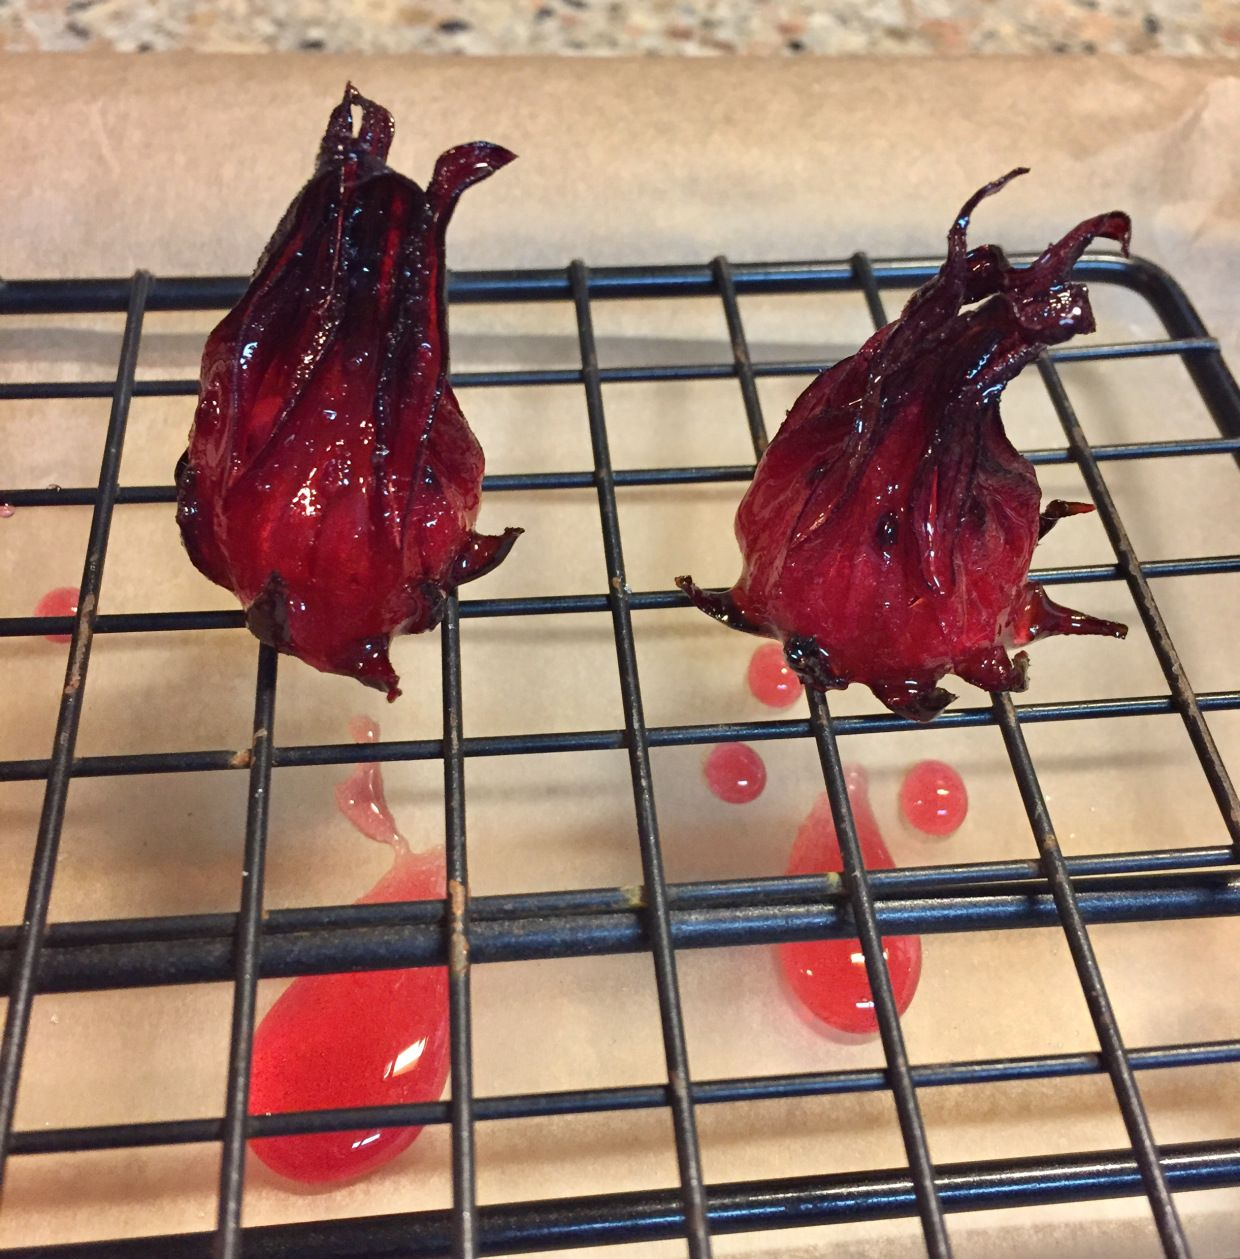 Candied Roselle Hibiscus Hibiscus Recipe Hibiscus Flower Food